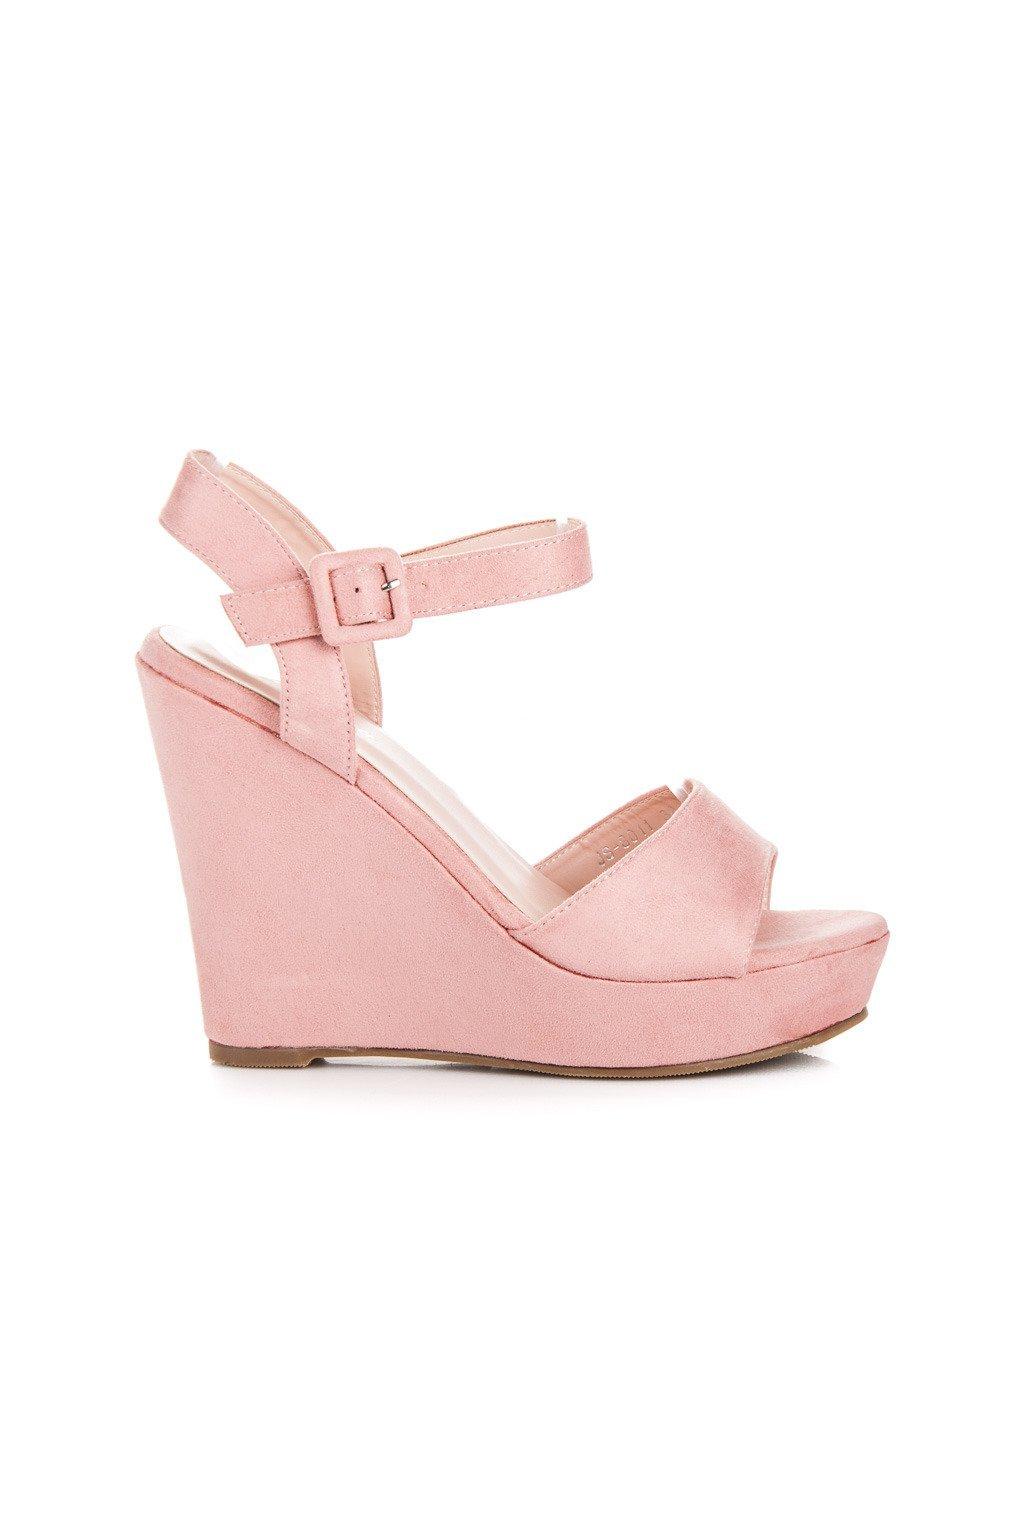 Ružové sandále na platforme JS8011P ada574e844c